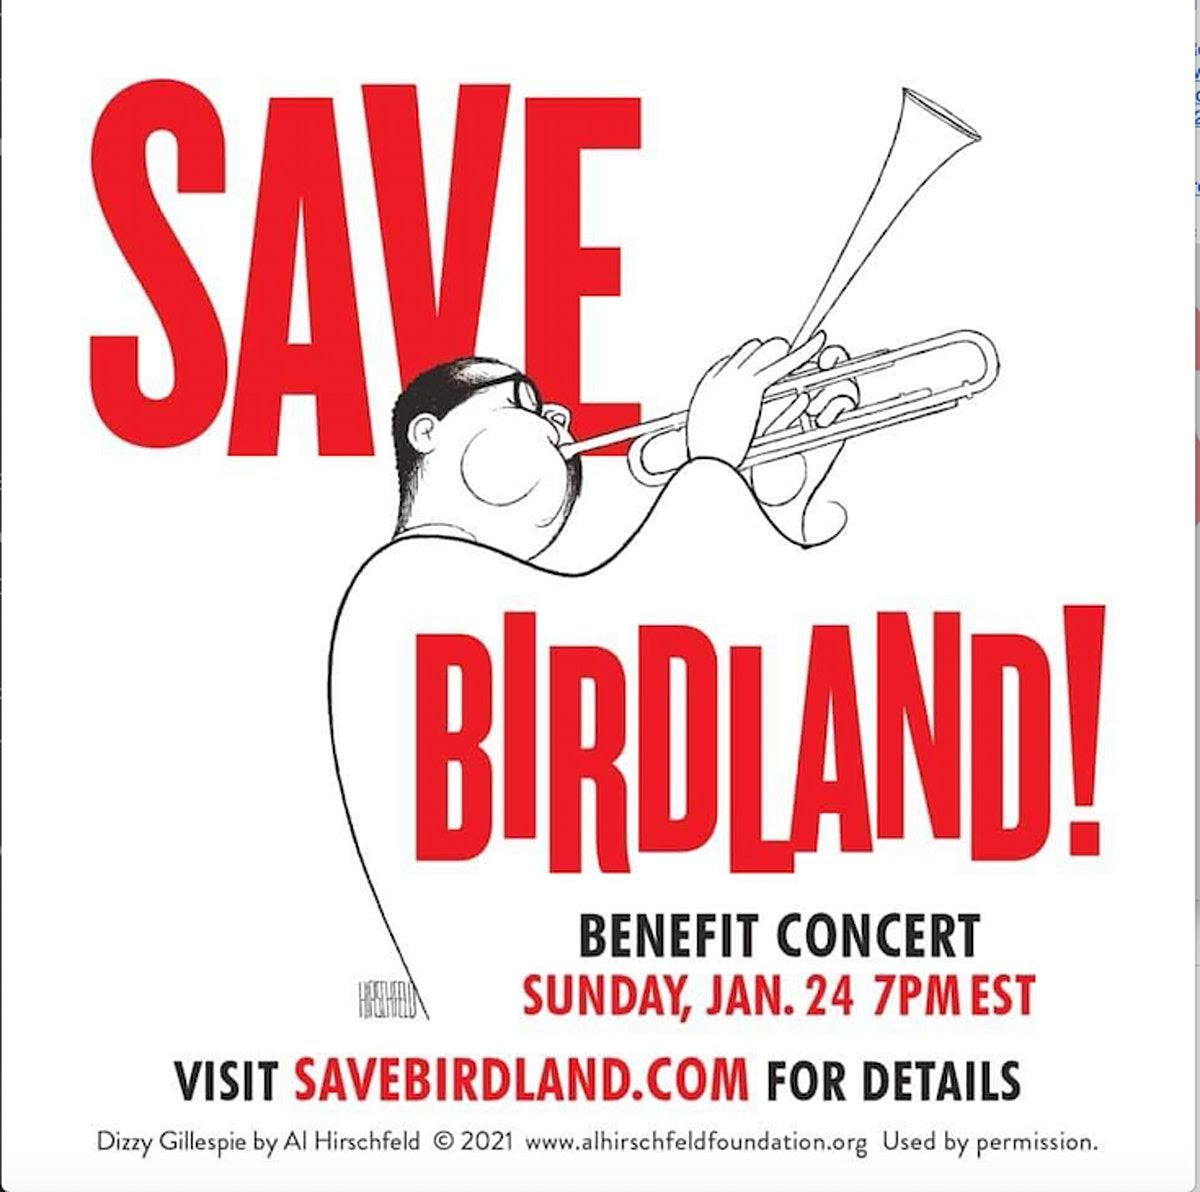 savebirdland